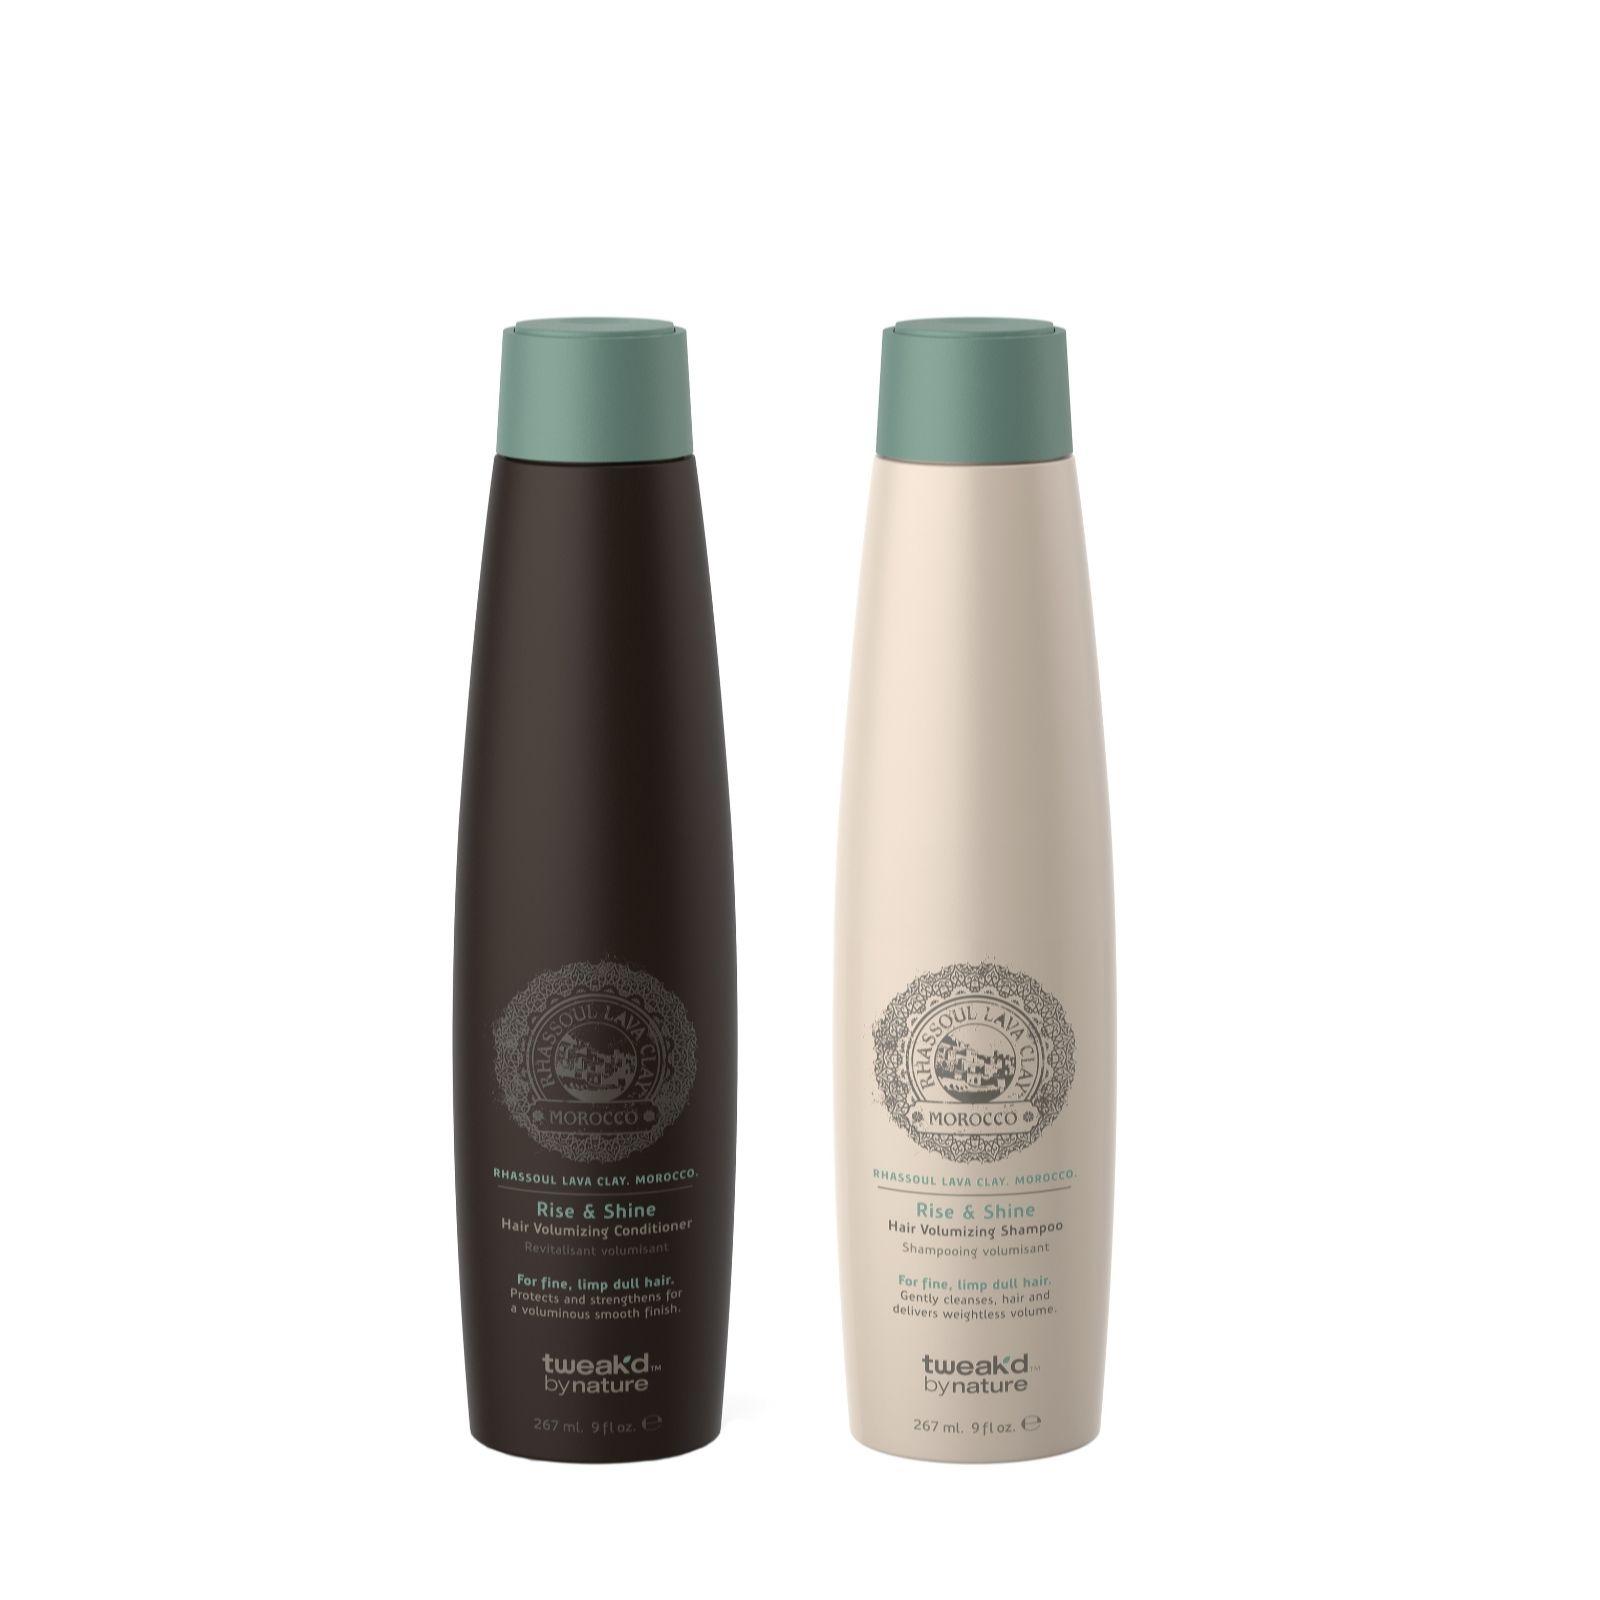 Tweakd Rhassoul Rise Amp Shine Volumising Shampoo Amp Conditioner Set 267ml QVC UK